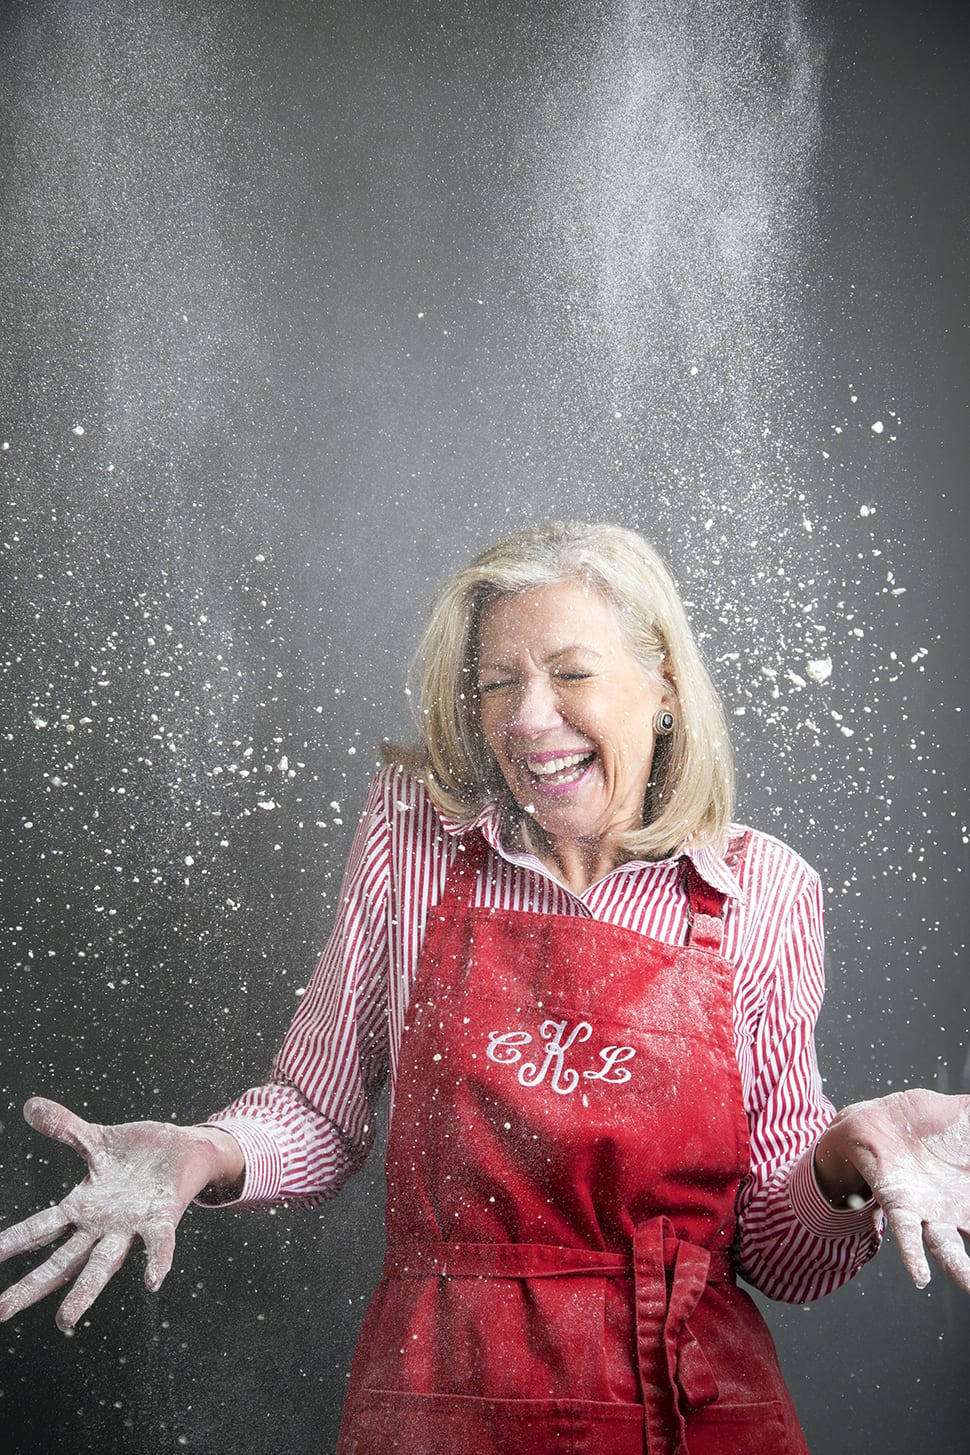 How Cheryl Krueger Founded Pastry Company Cheryl & Co